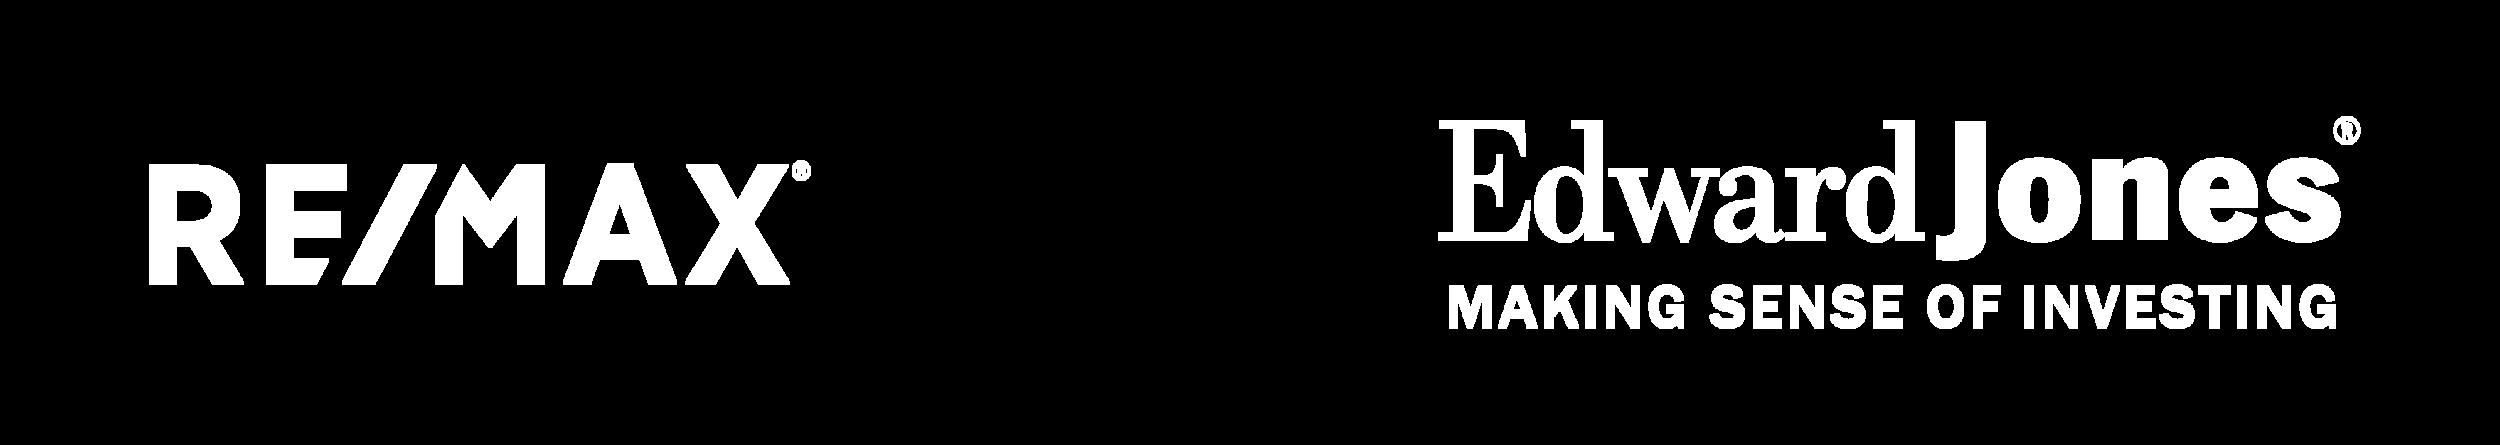 Client logos3-01.png